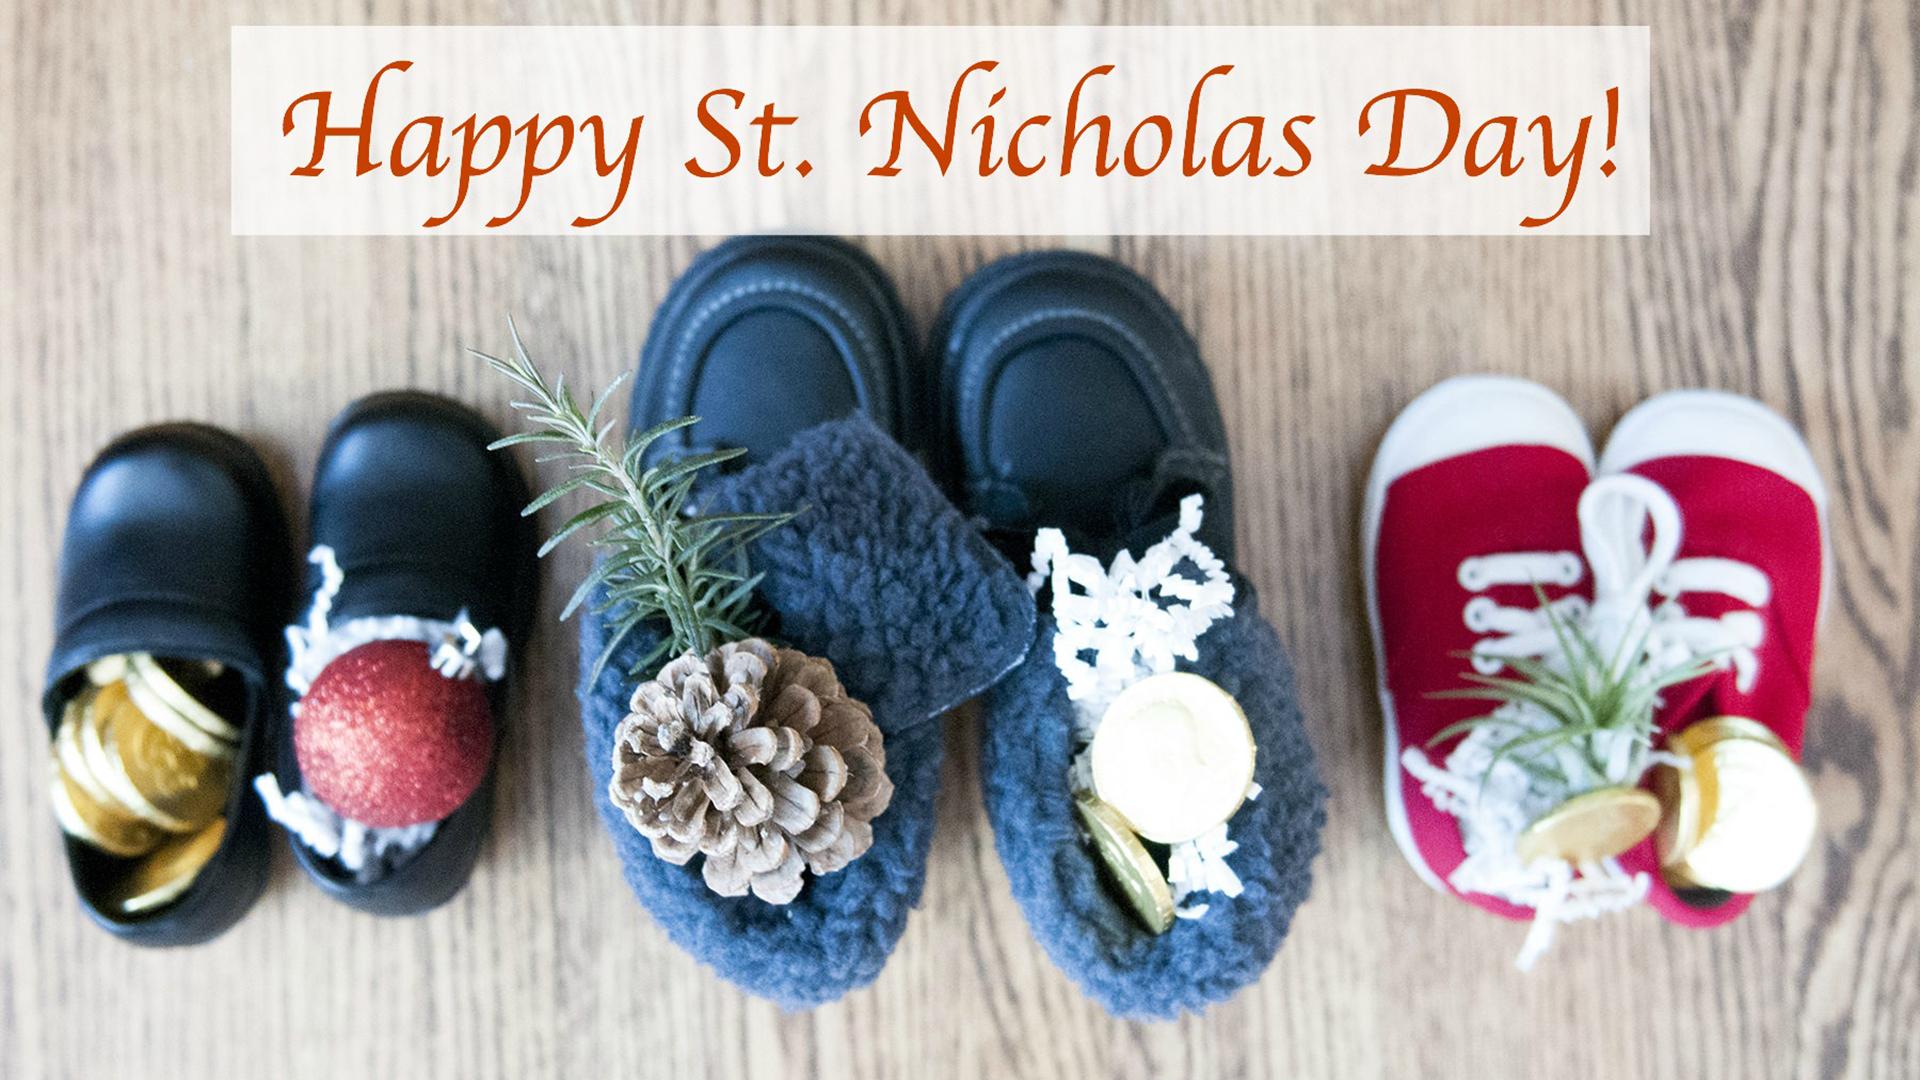 Saint Nicholas Day Background Graphic for Digital Signage